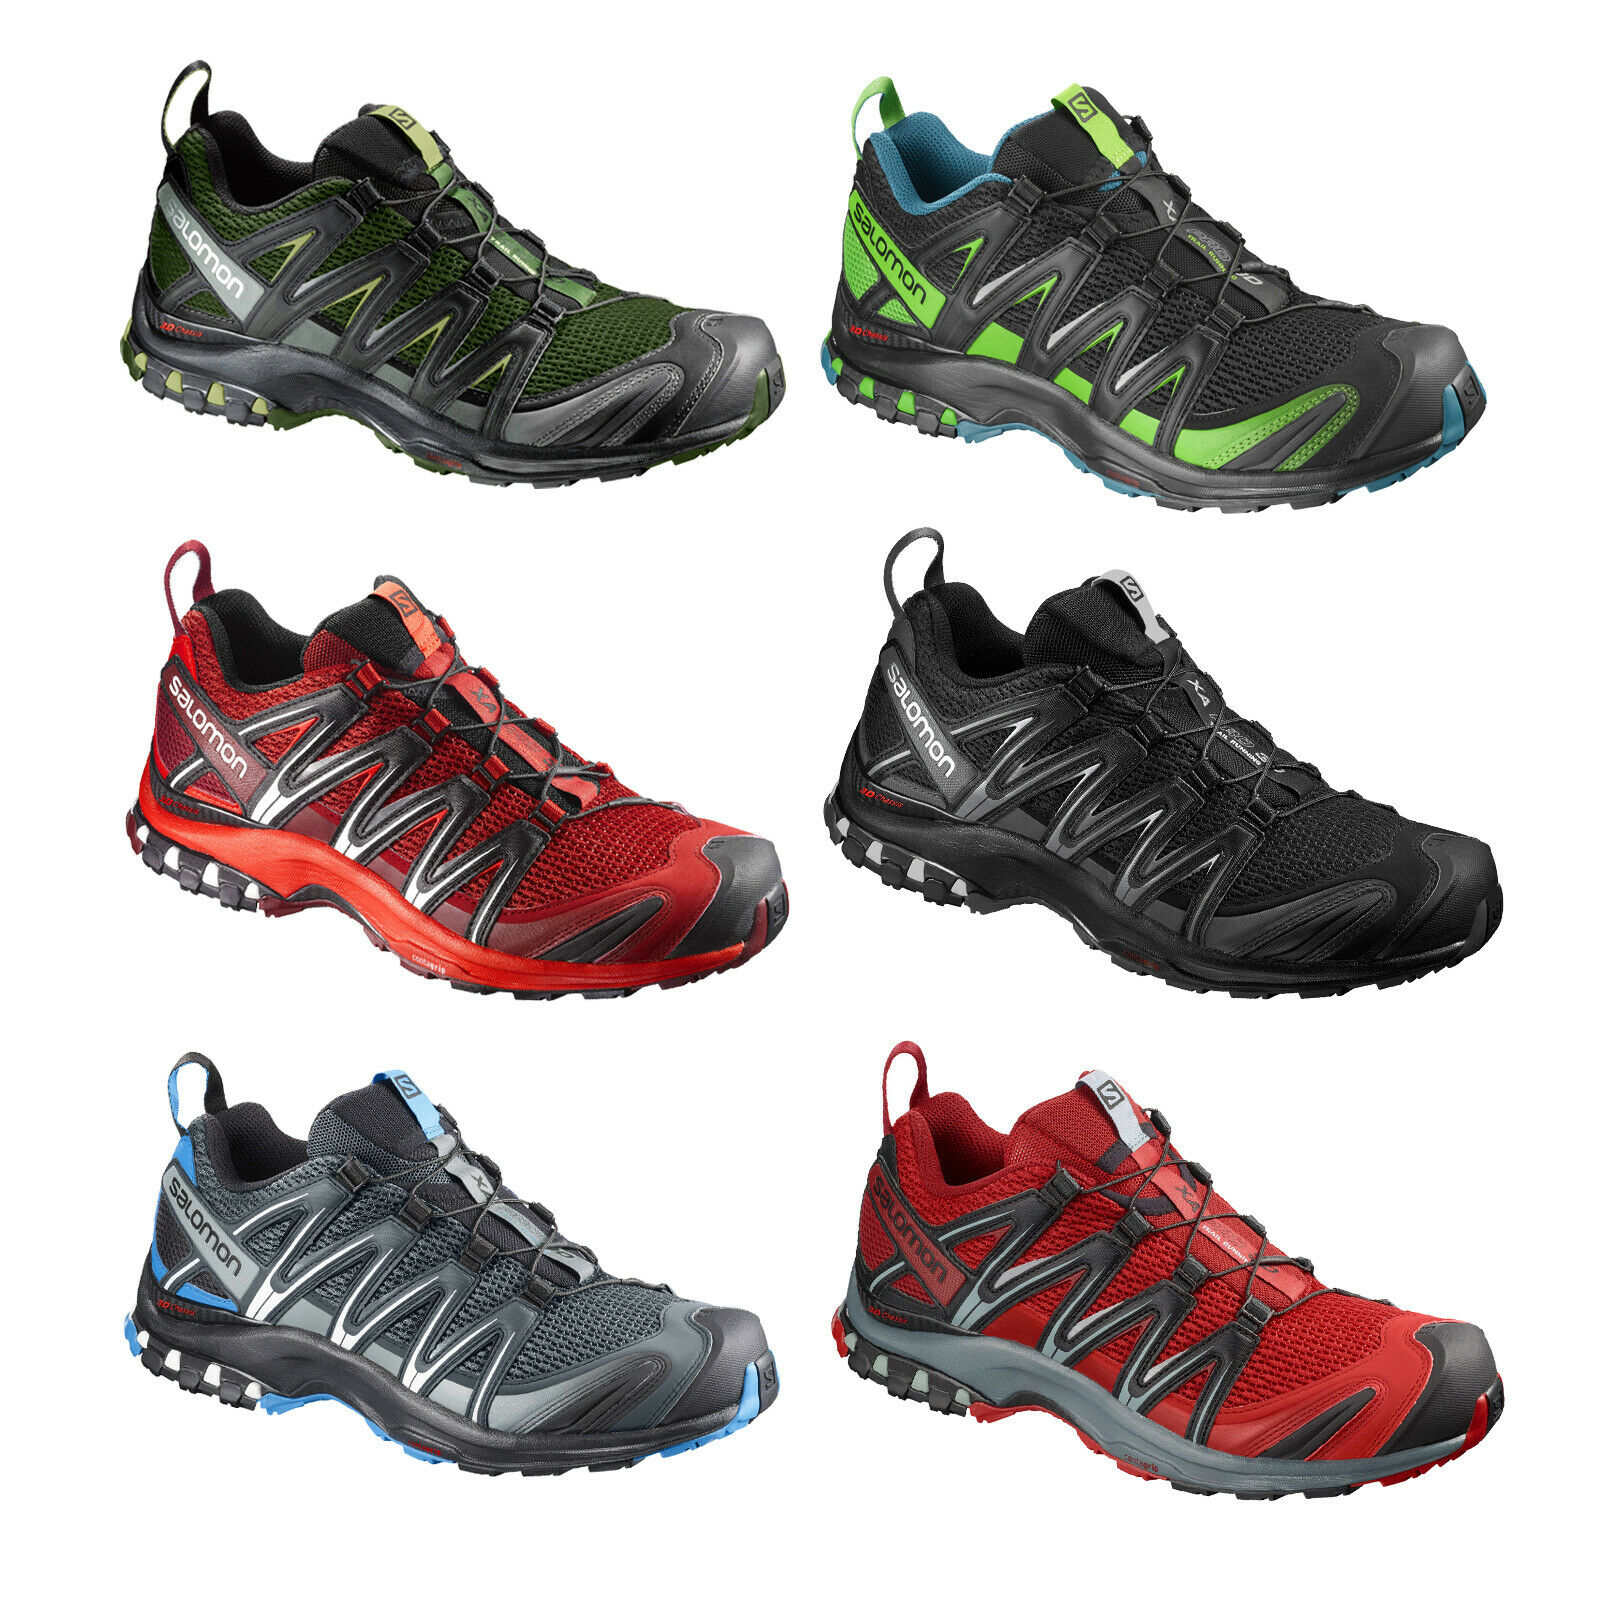 Reebok Ridgerider Trail 4.0 GTX Walkingschuhe Herren in